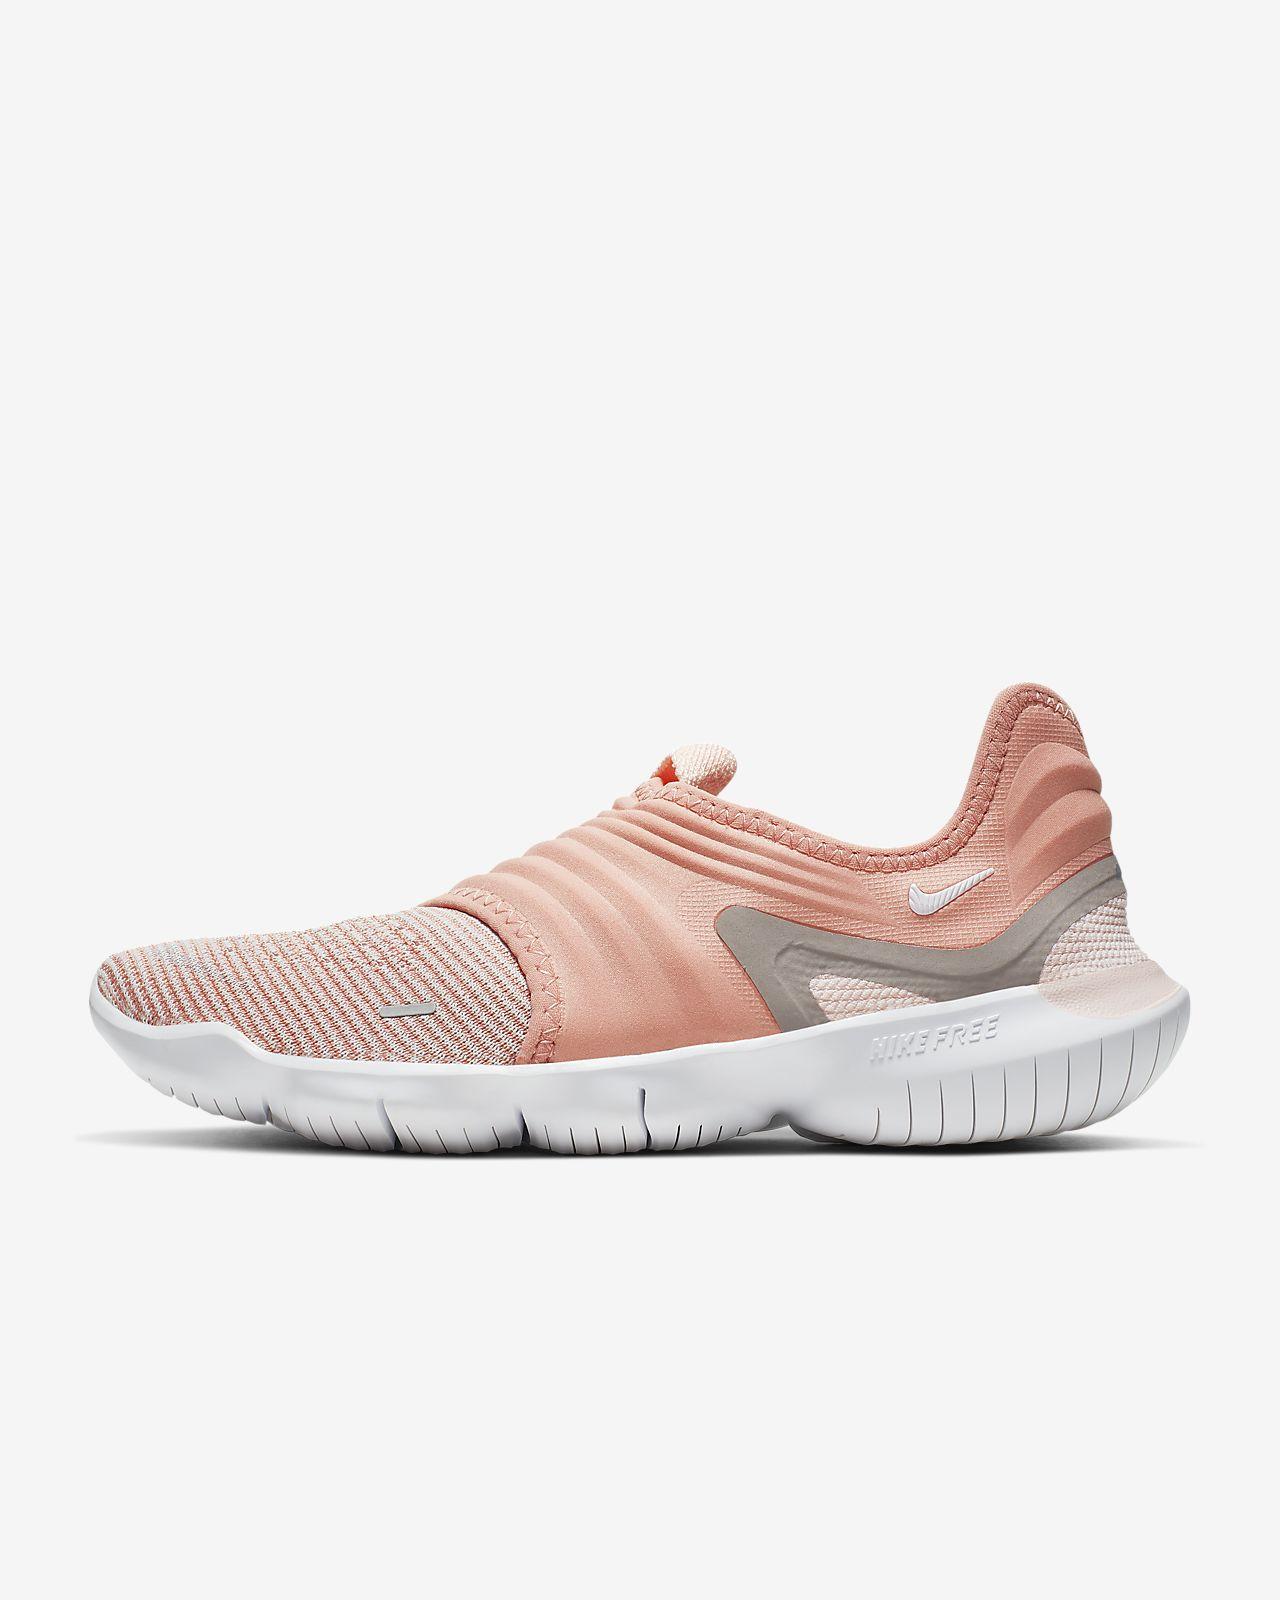 nike blazer alte nere, Scarpe Nike Running Free 5.0 Donna V3